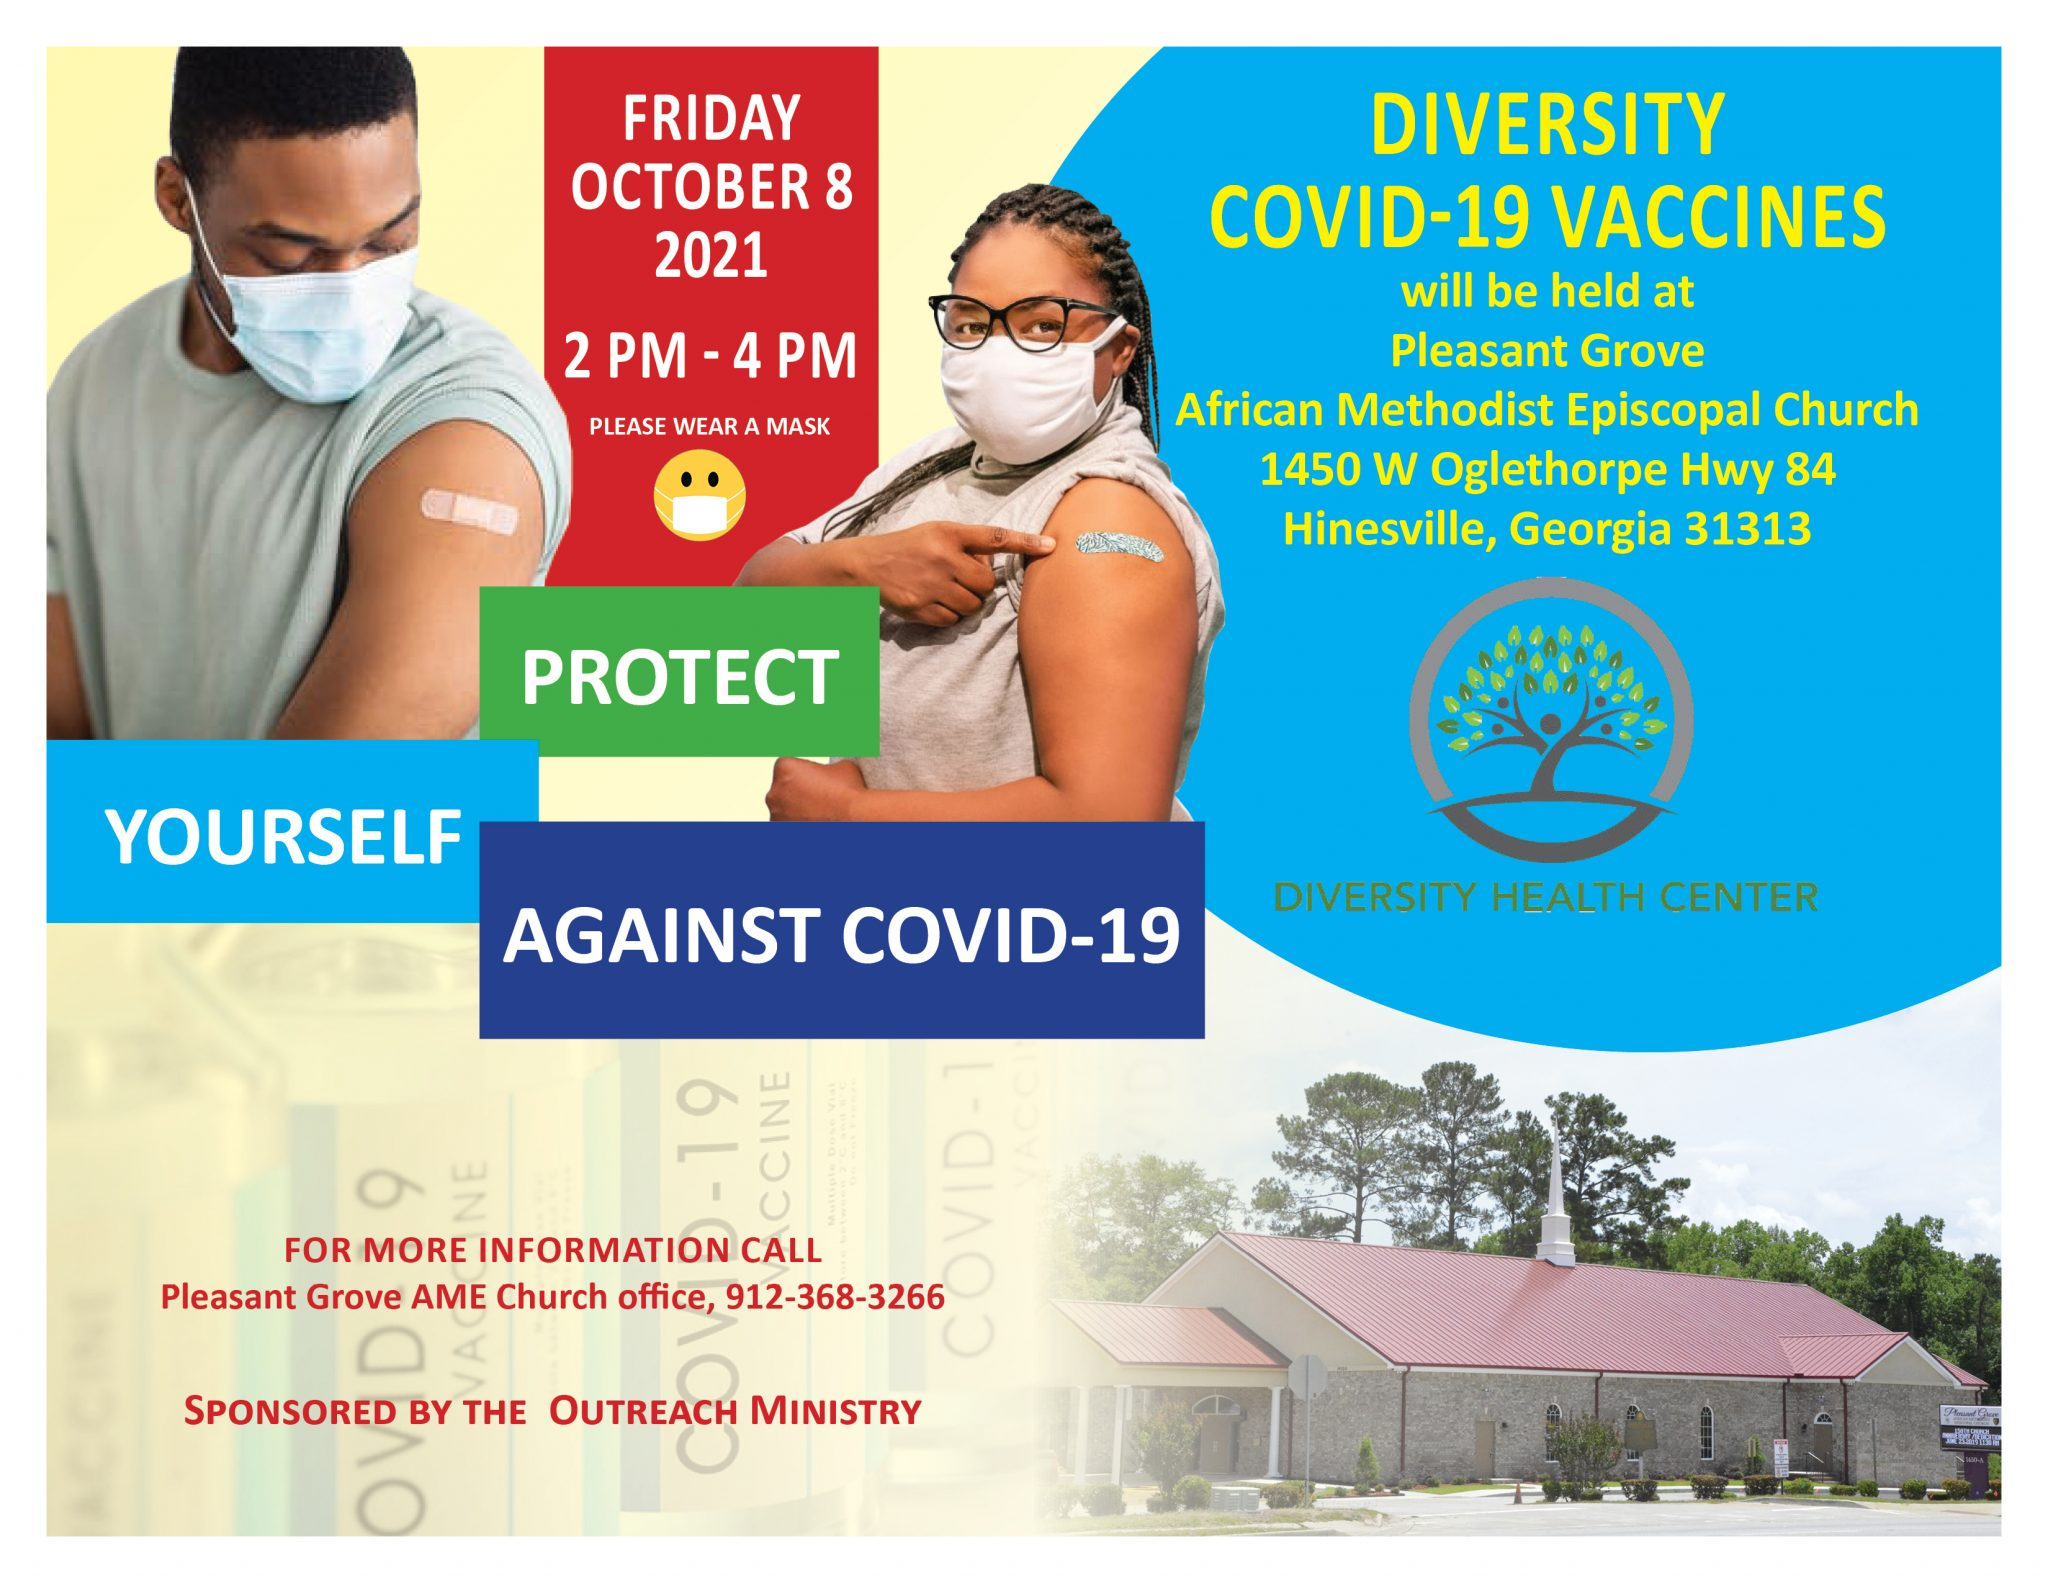 Diversity COVID-19 Vaccines